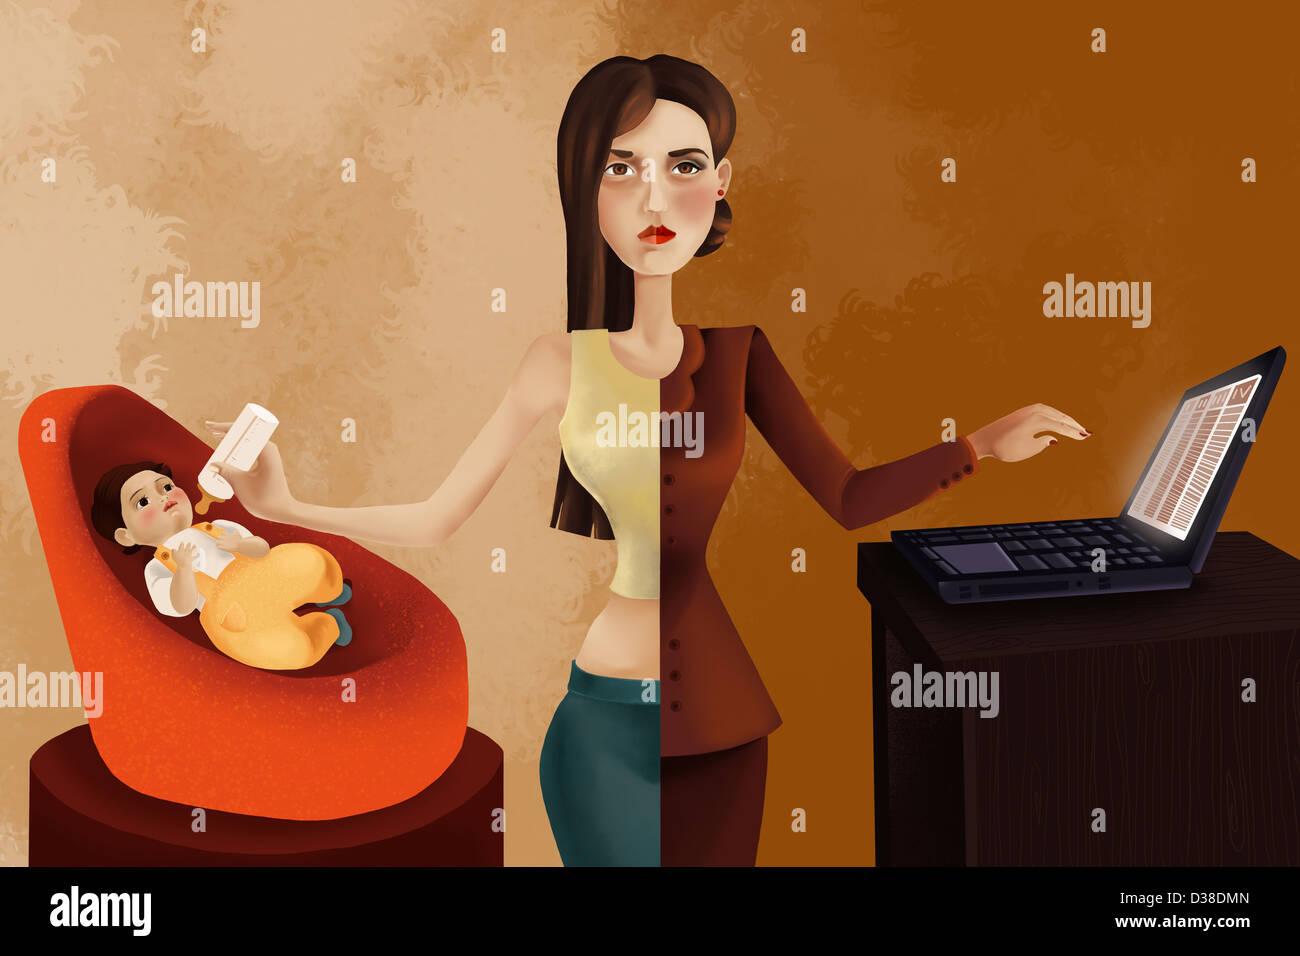 Illustrative image of professional woman feeding her baby while using laptop - Stock Image